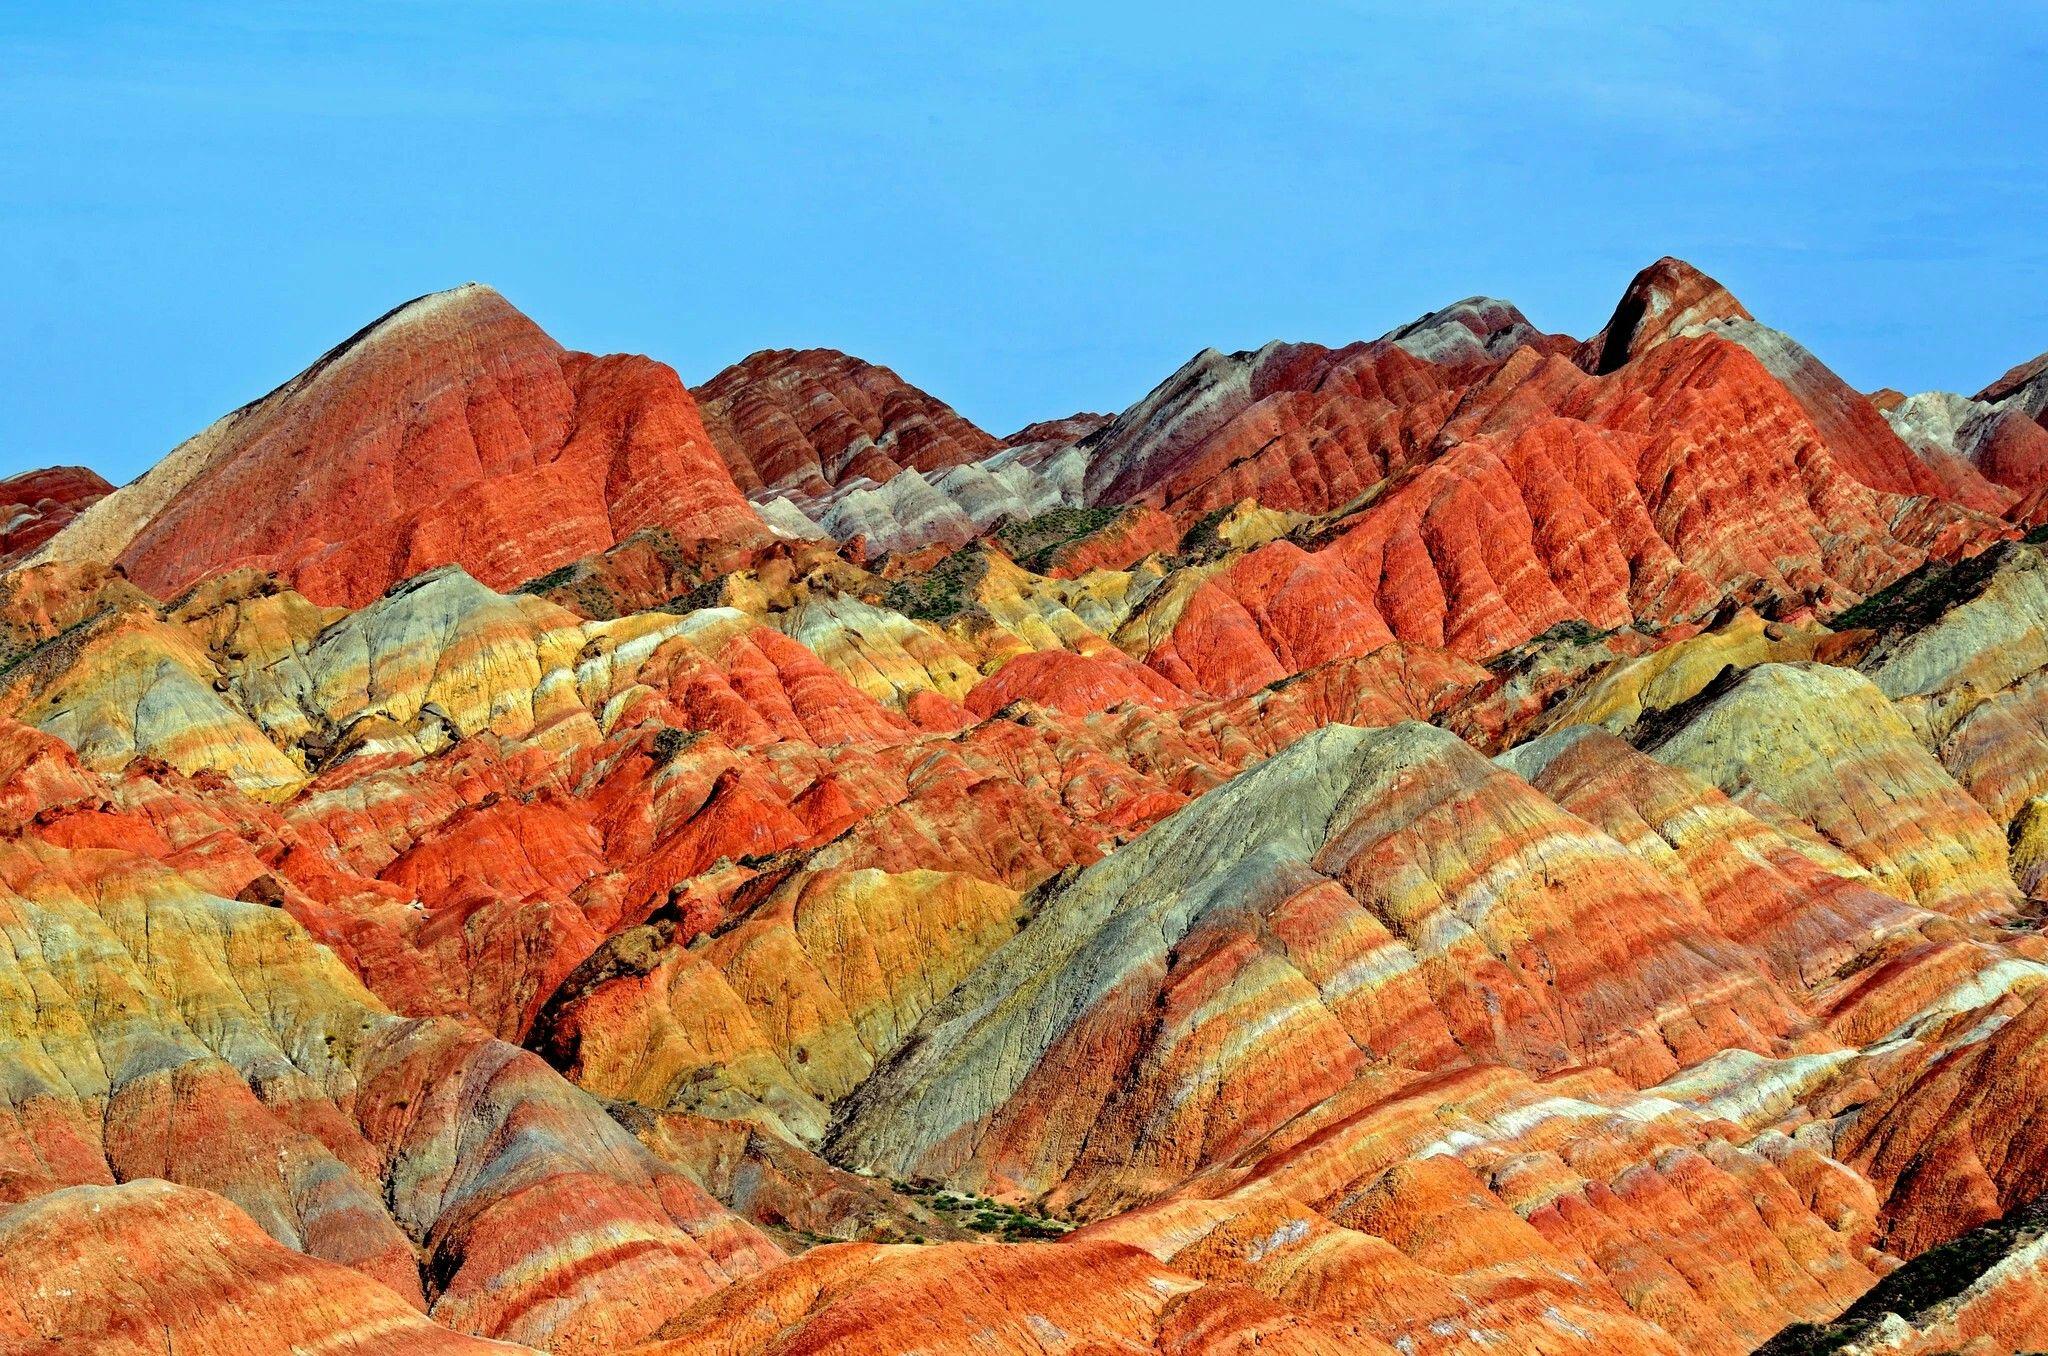 China rocks, mountains